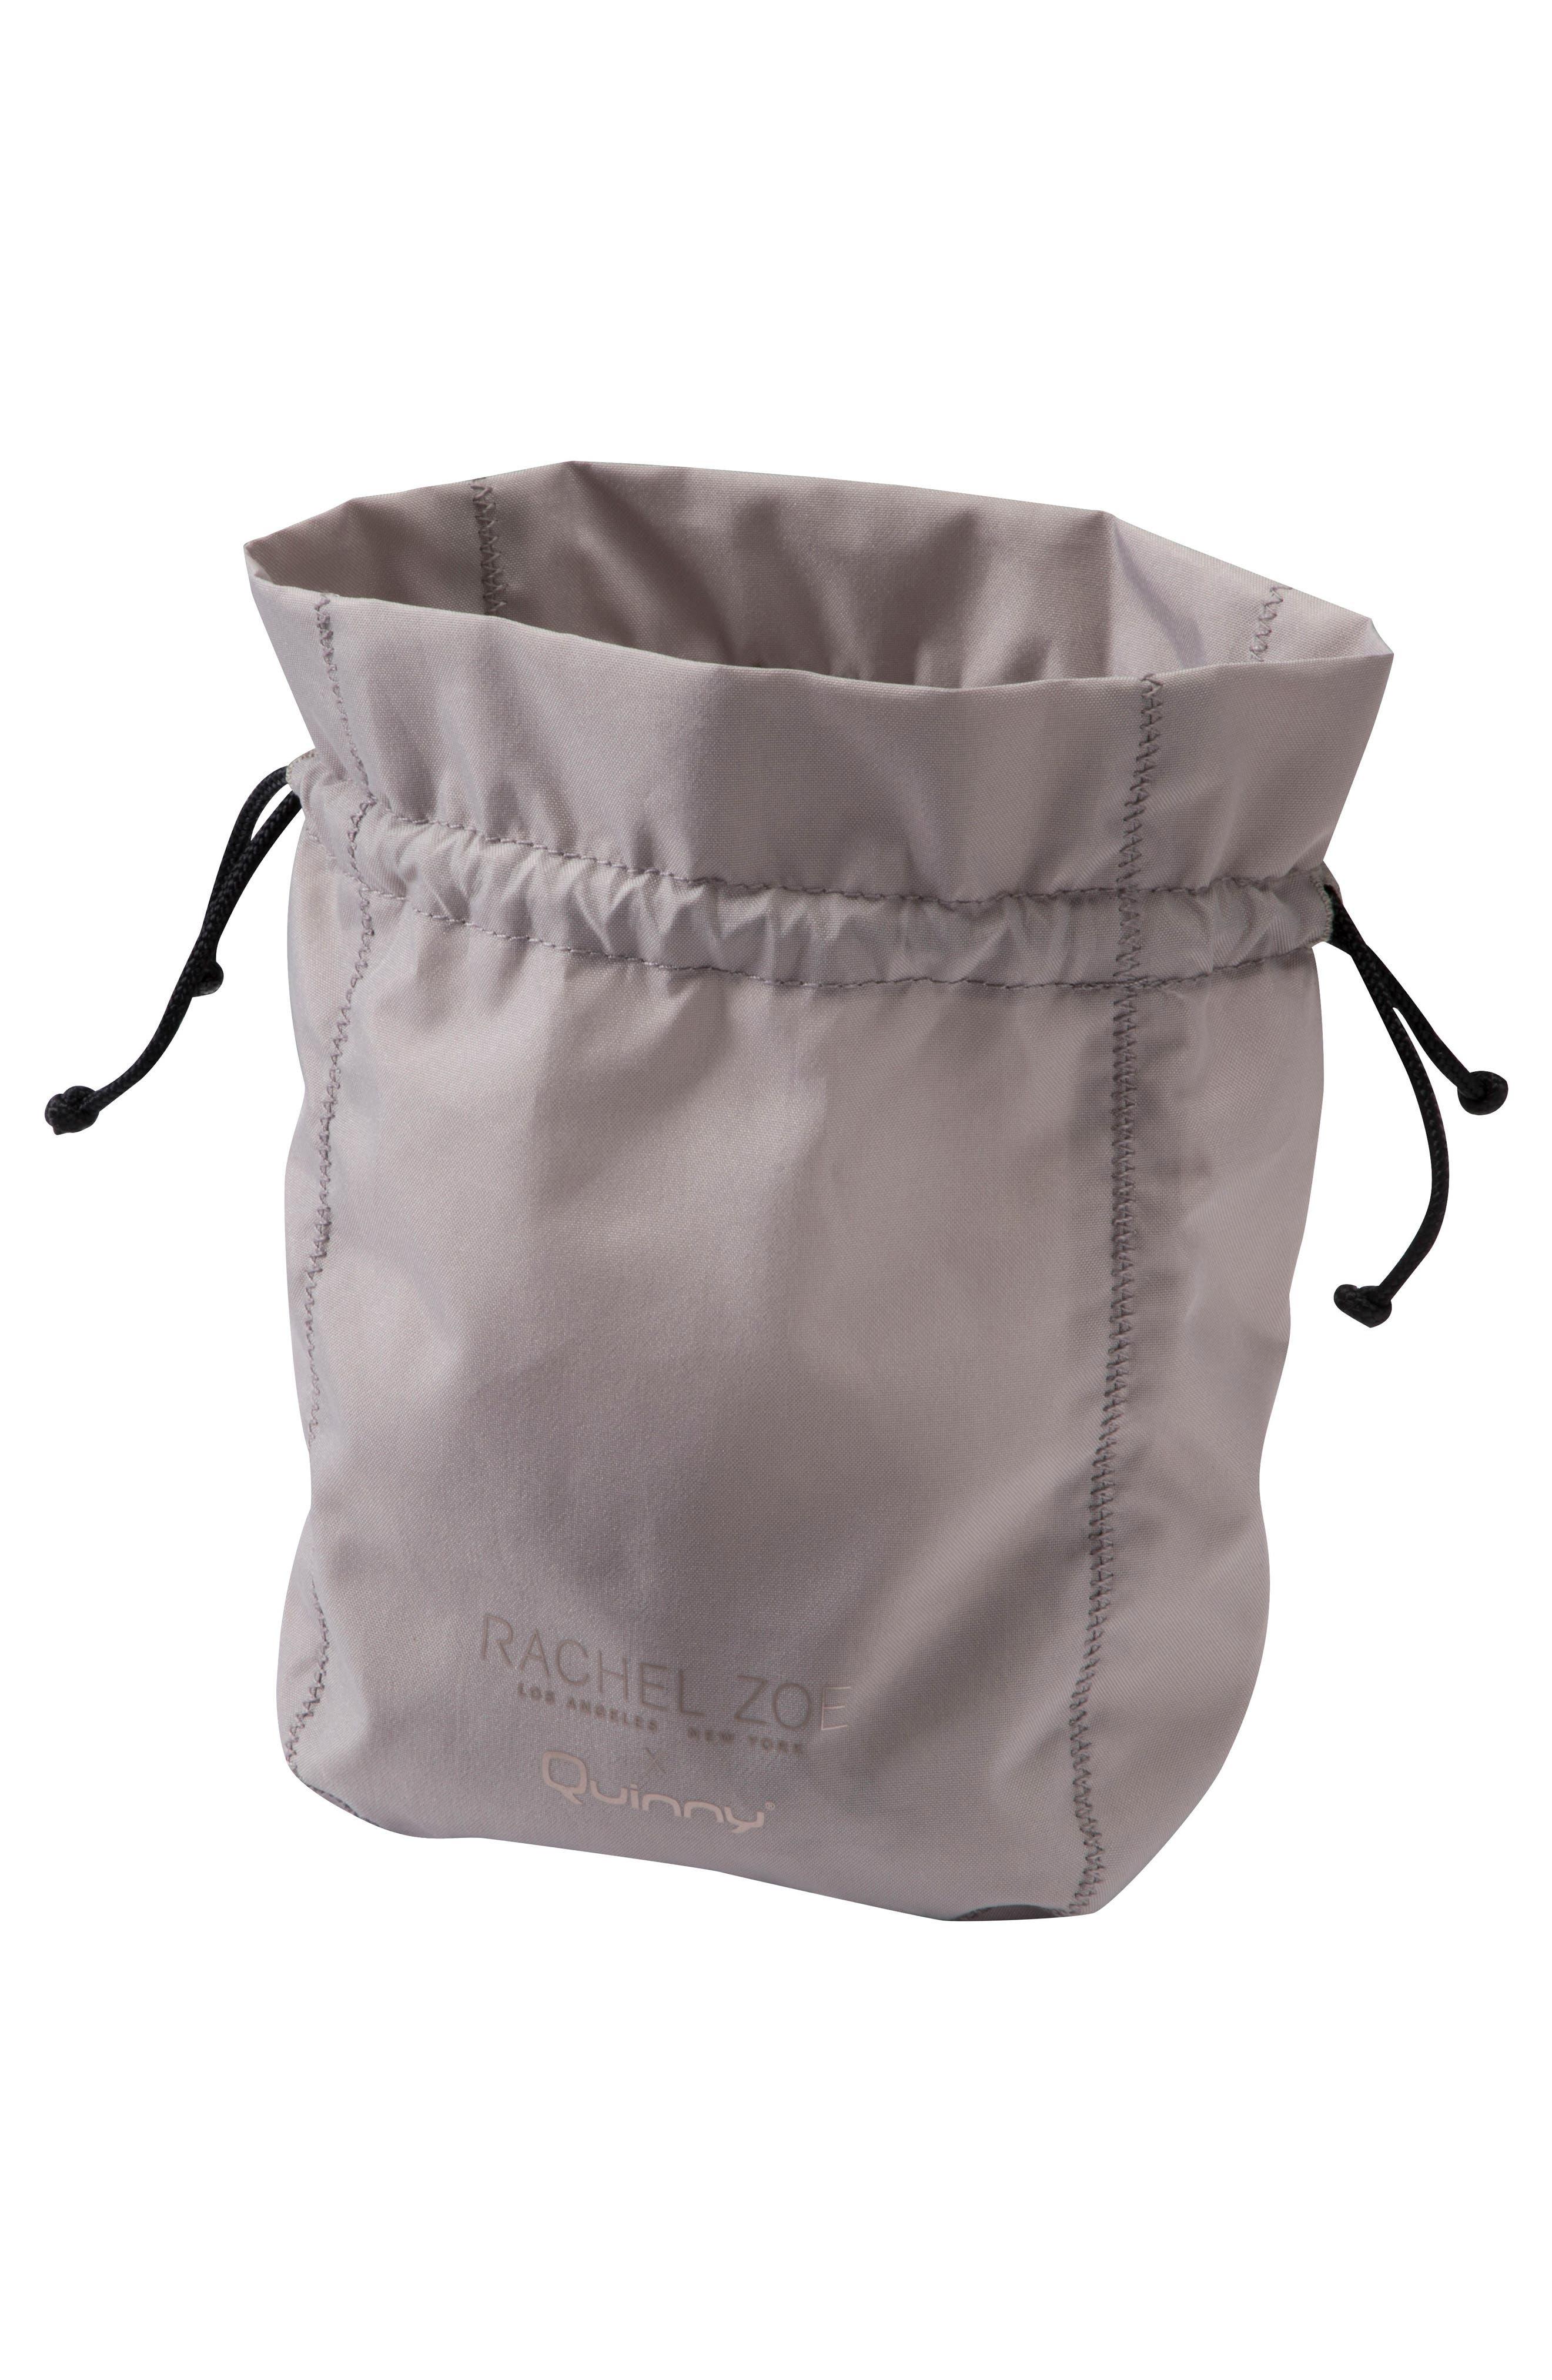 x Rachel Zoe Luxe Sport Diaper Bag,                             Alternate thumbnail 9, color,                             Rz Luxe Sport